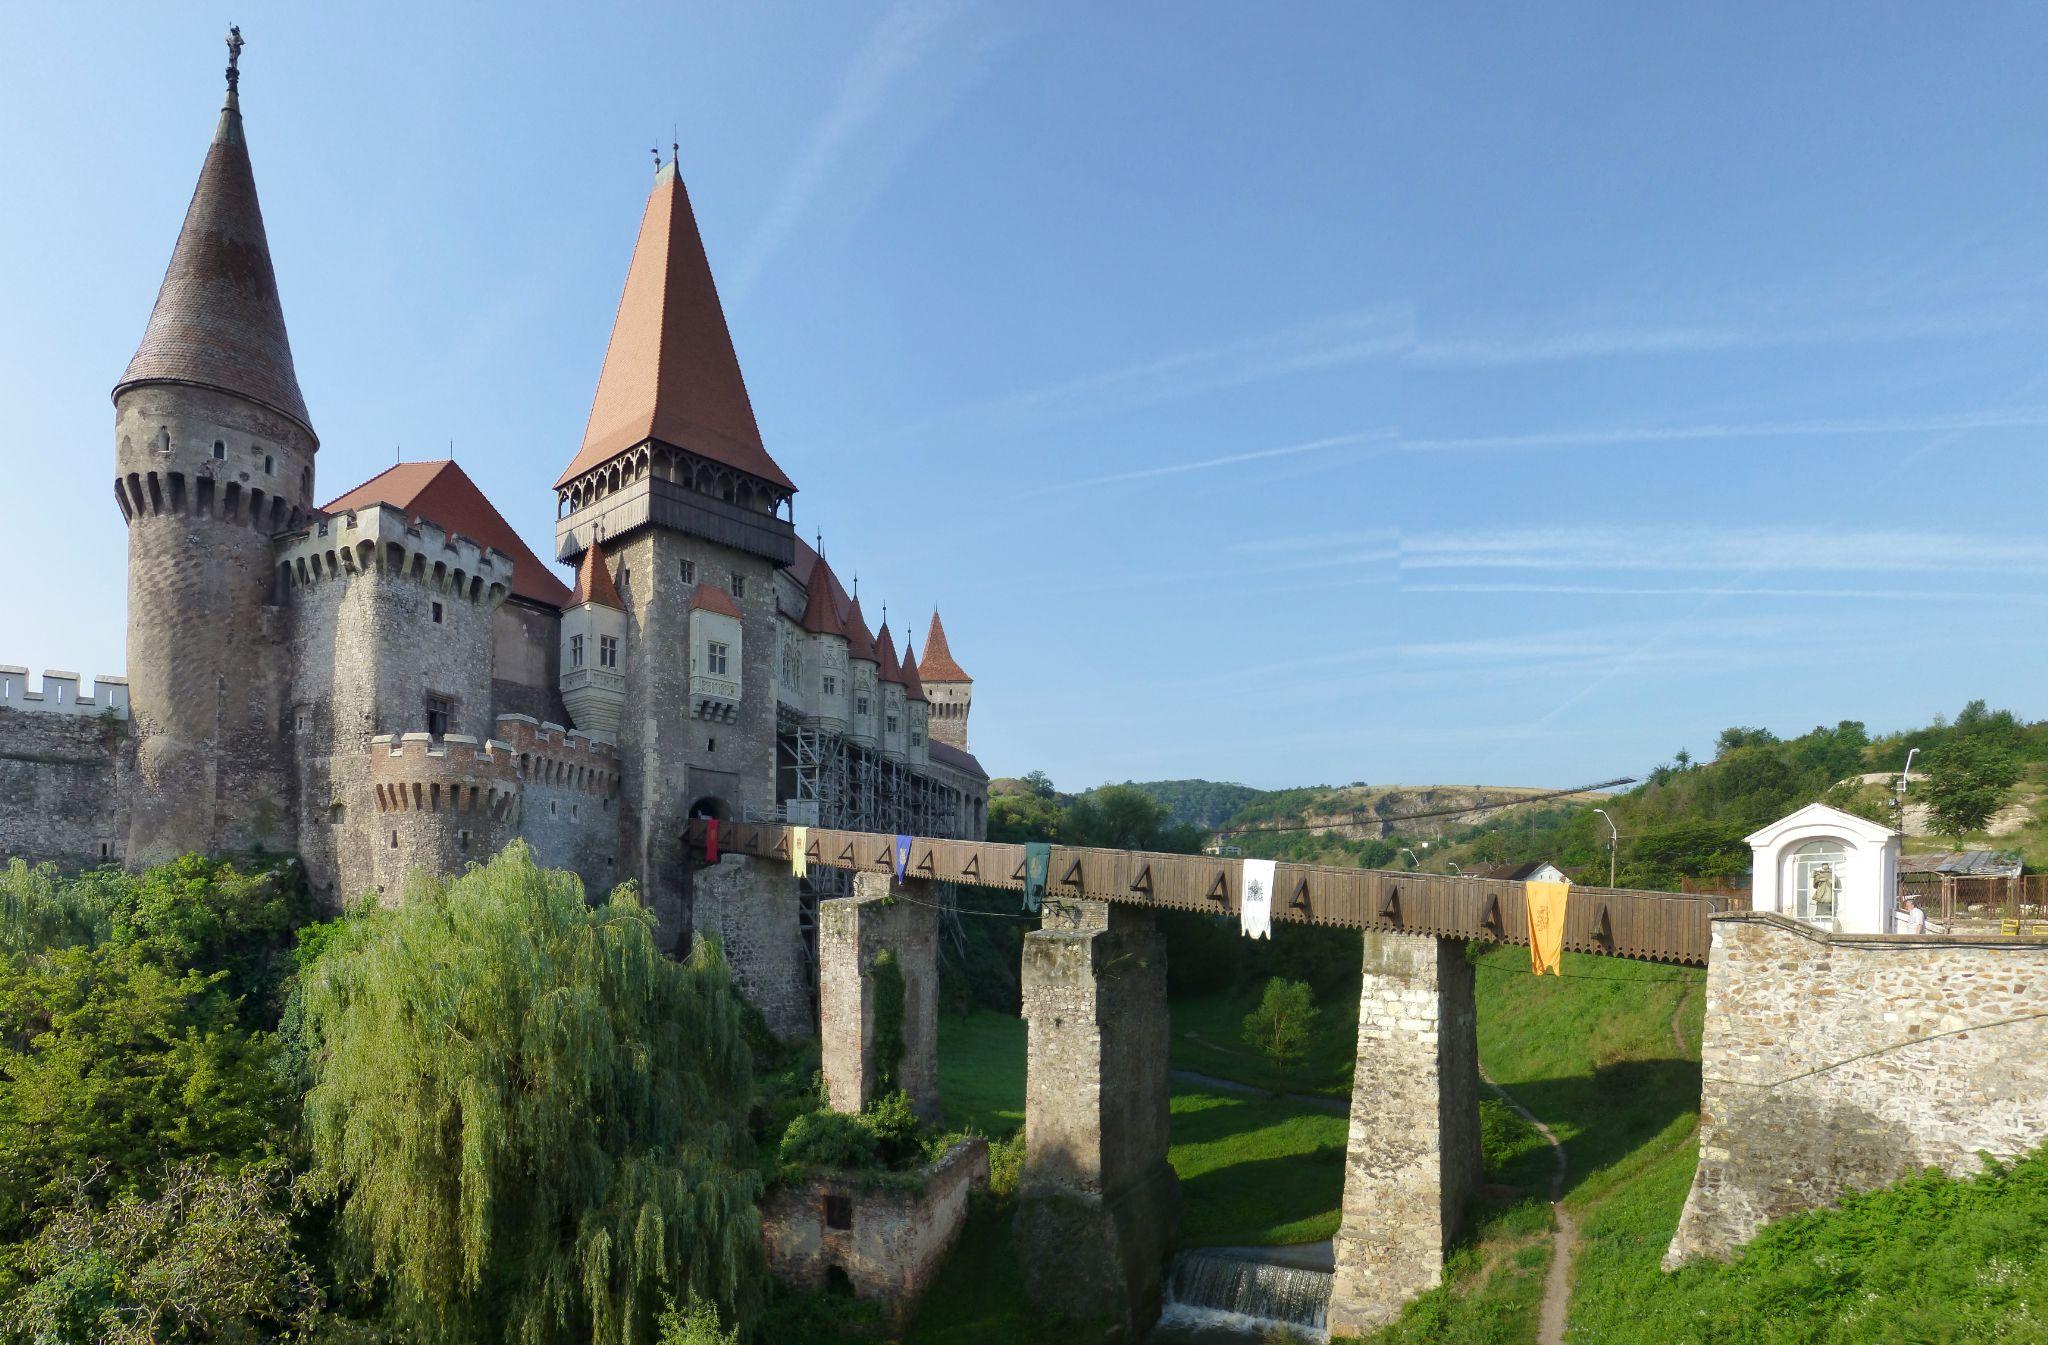 Castelul Huniazilor-Corvinilor by Roumanian